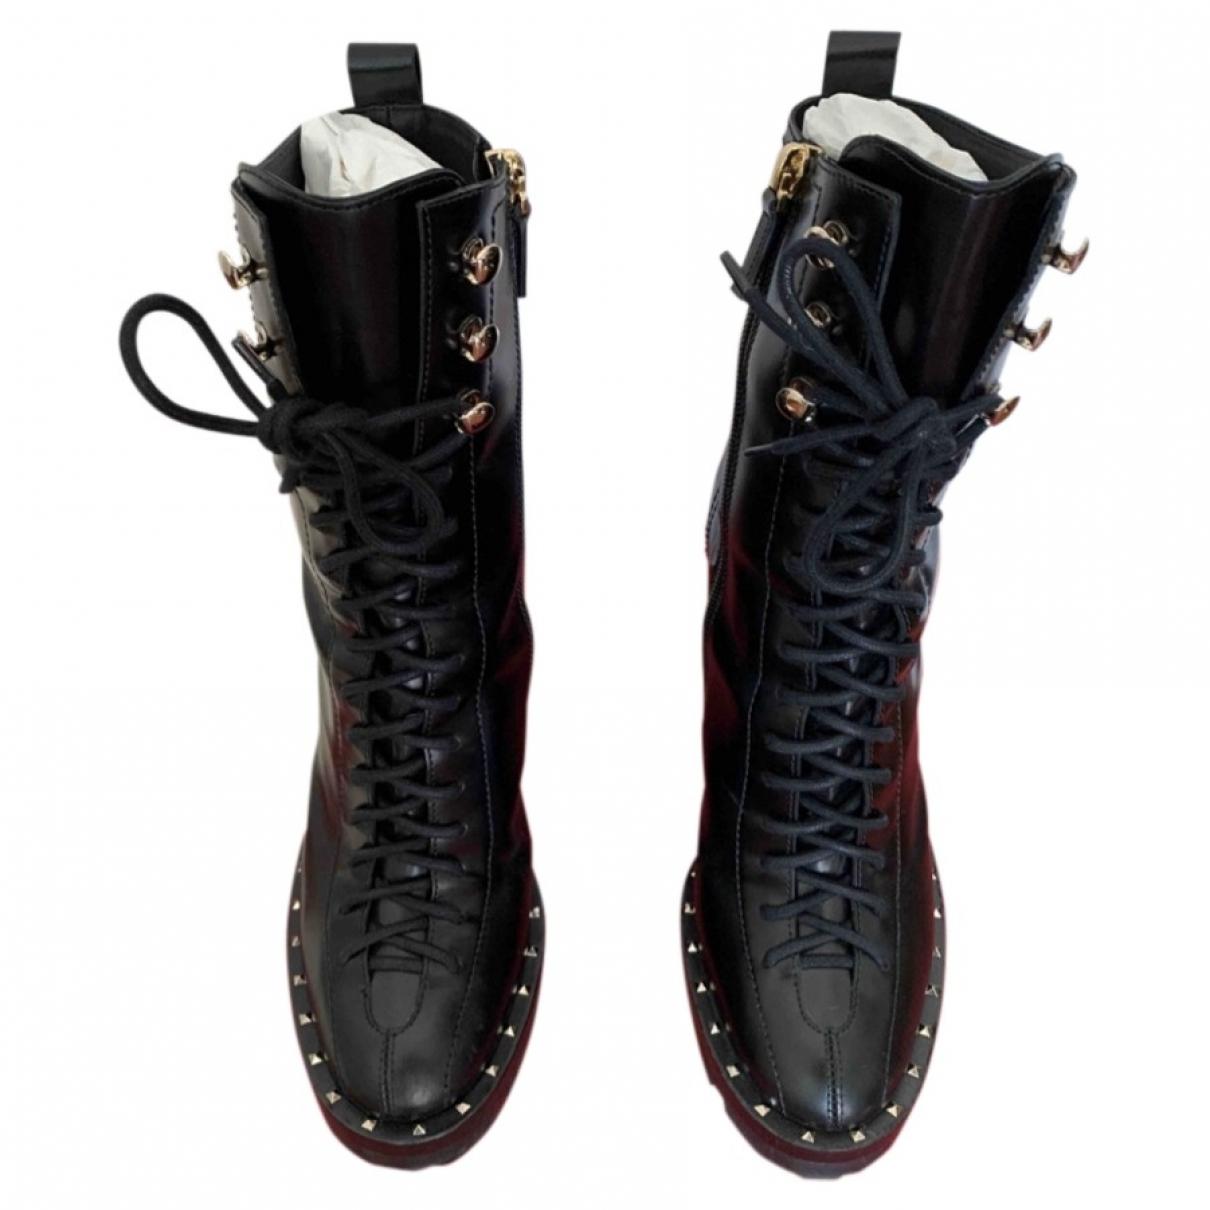 Valentino Garavani Rockstud Black Leather Boots for Women 37 EU